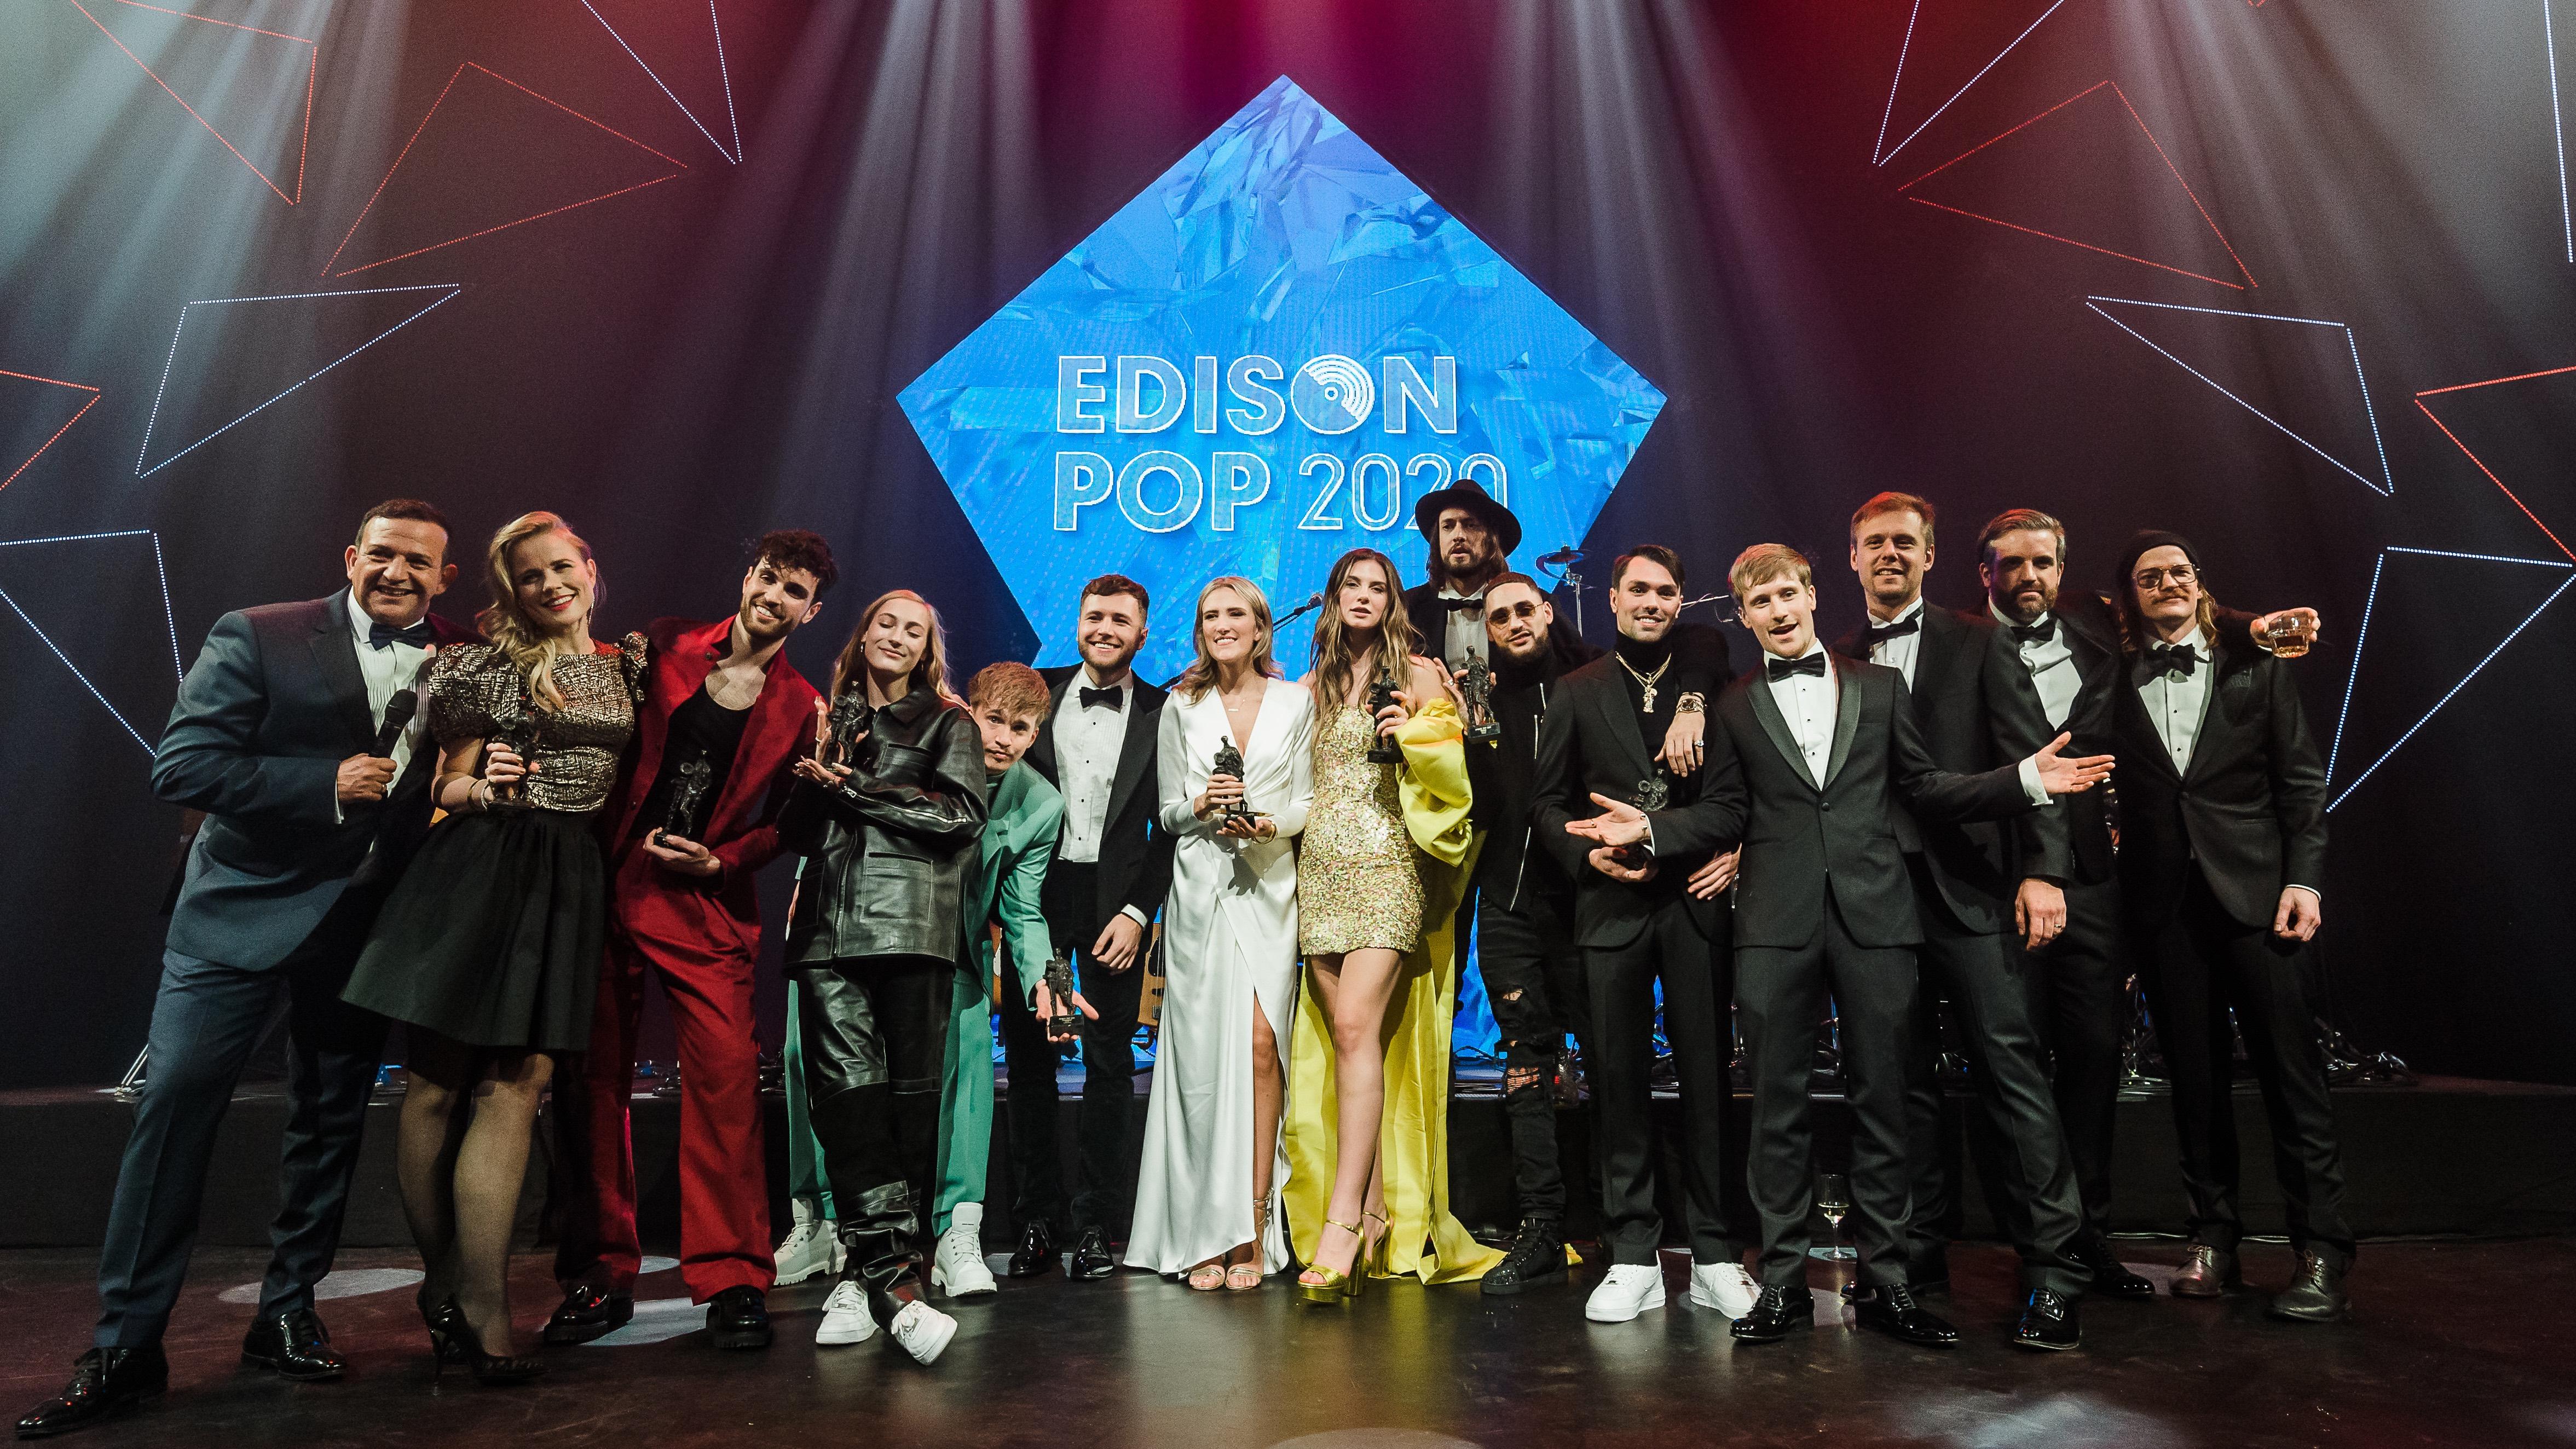 Stichting Edison